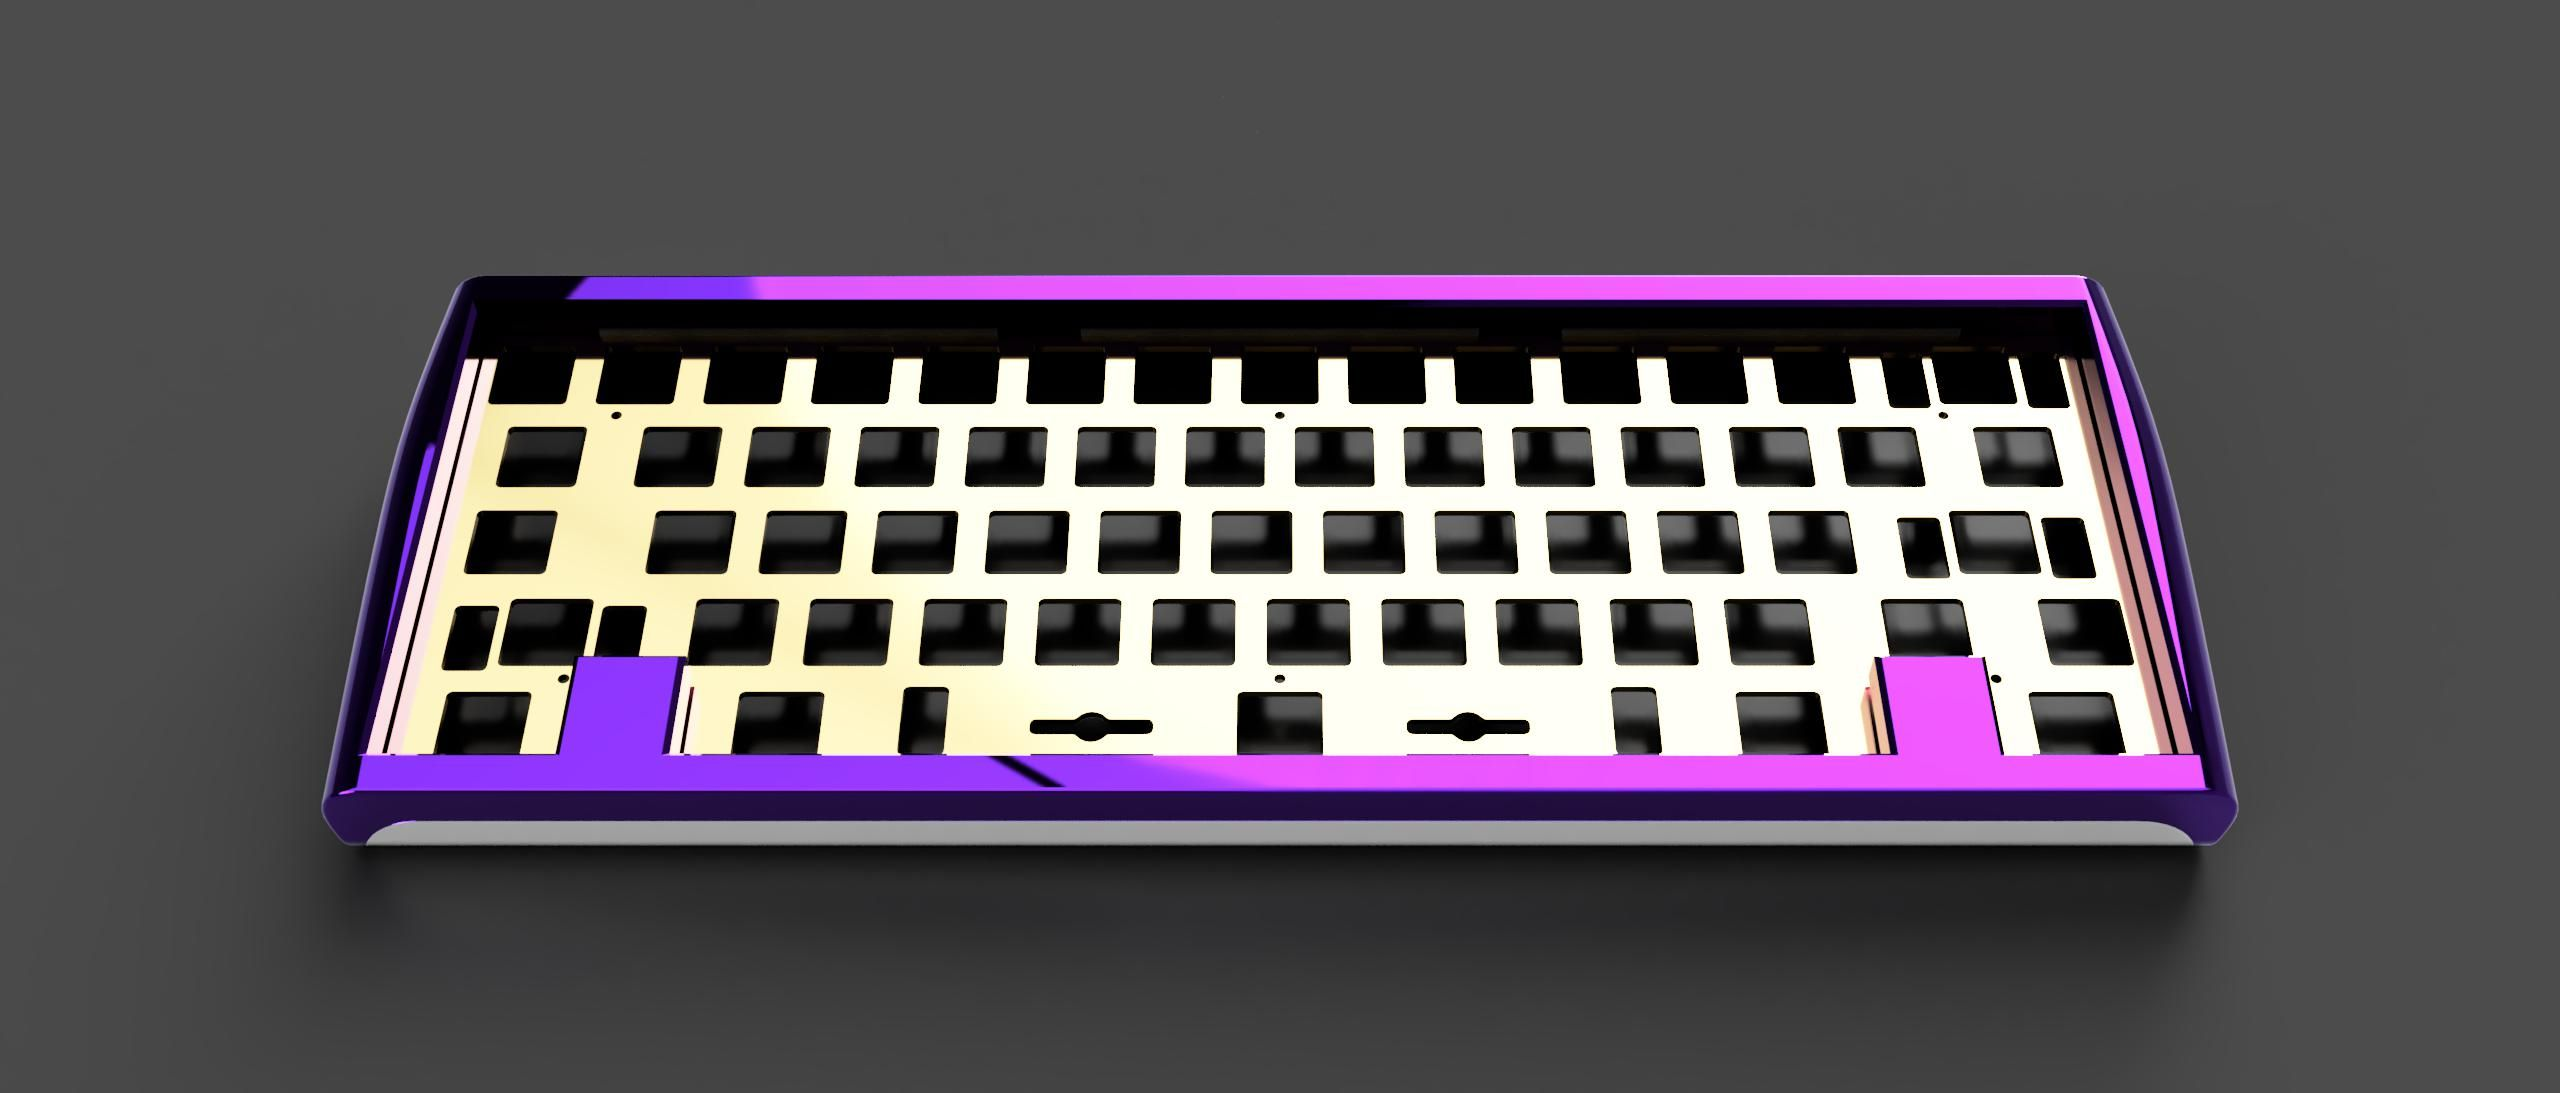 12+ Egyptian keyboard information